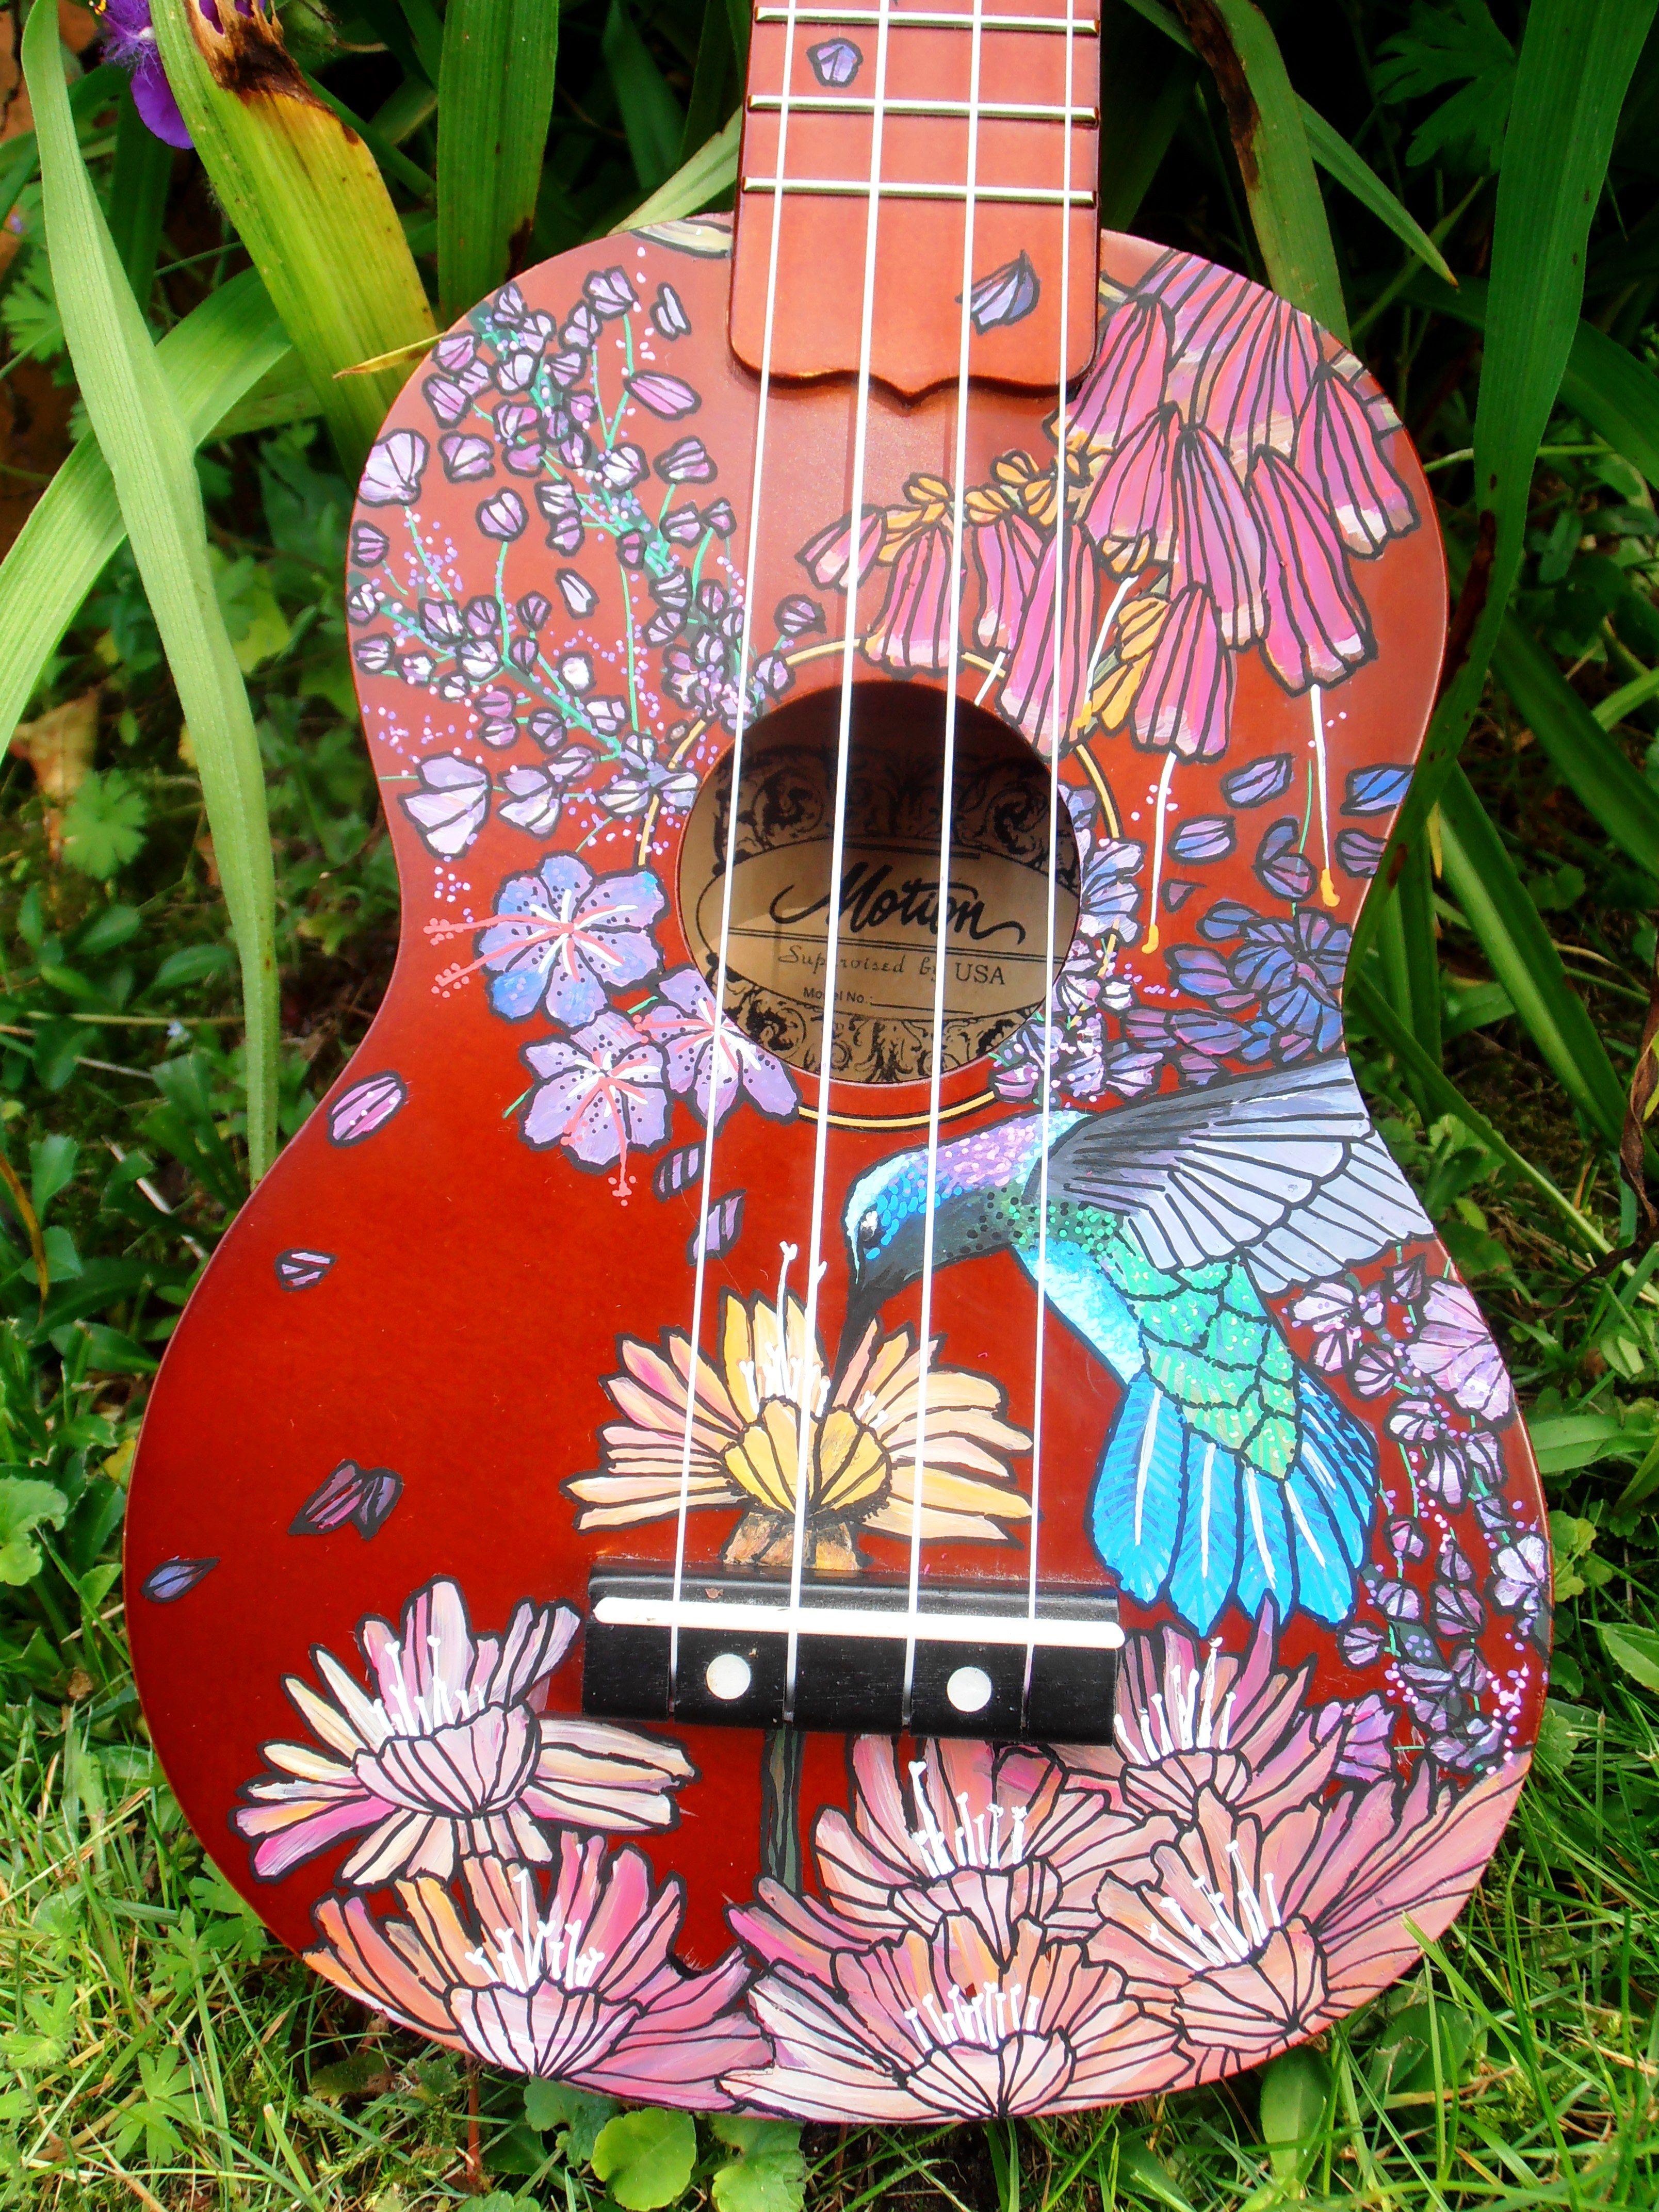 Handpainted Ukulele For A Friend Who Loves Hummingbirds By Suzanne Van Gils Bemalte Ukulele Gitarren Bilder Gitarrenkunst